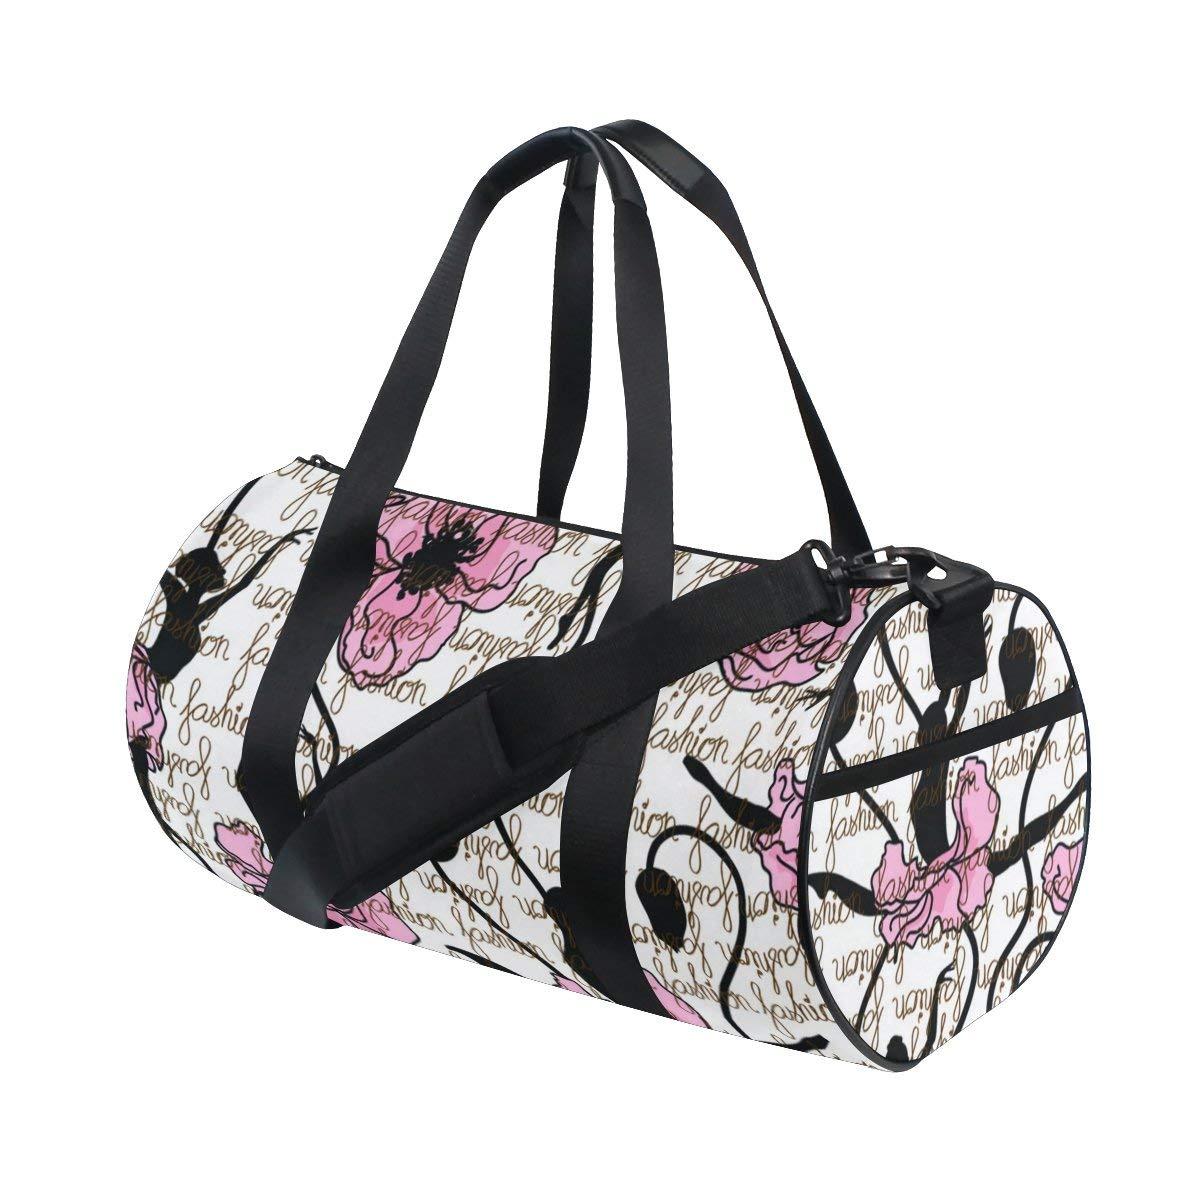 Naanle Fashion Style Ballerina Dancing Ballet Dancer Girl Gym bag Sports  Travel Duffle Bags for Men 268172be6ac31